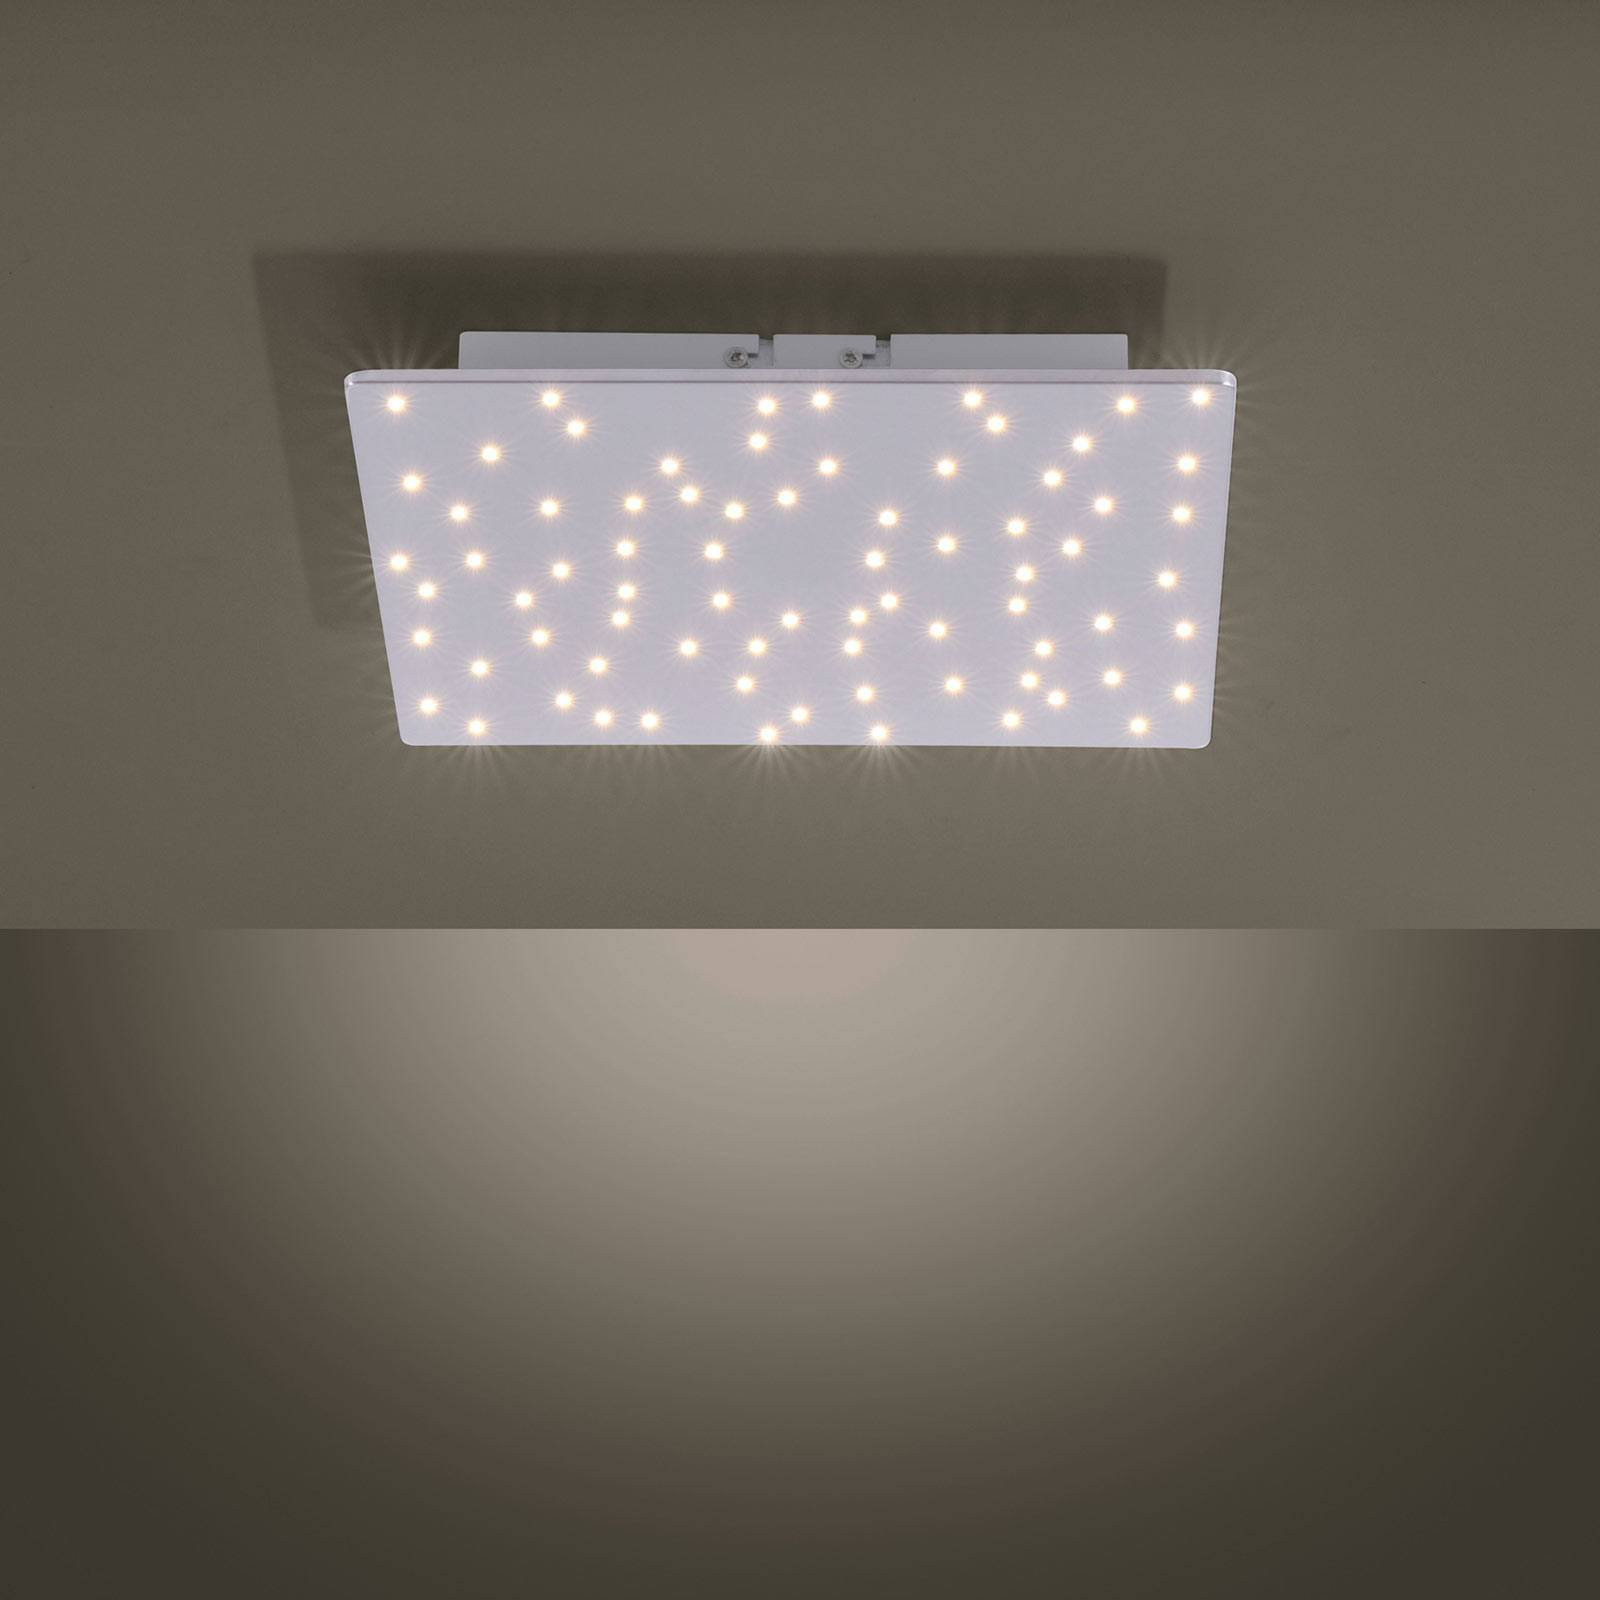 Sparkle LED-taklampe, tunable white, 30 x 30 cm